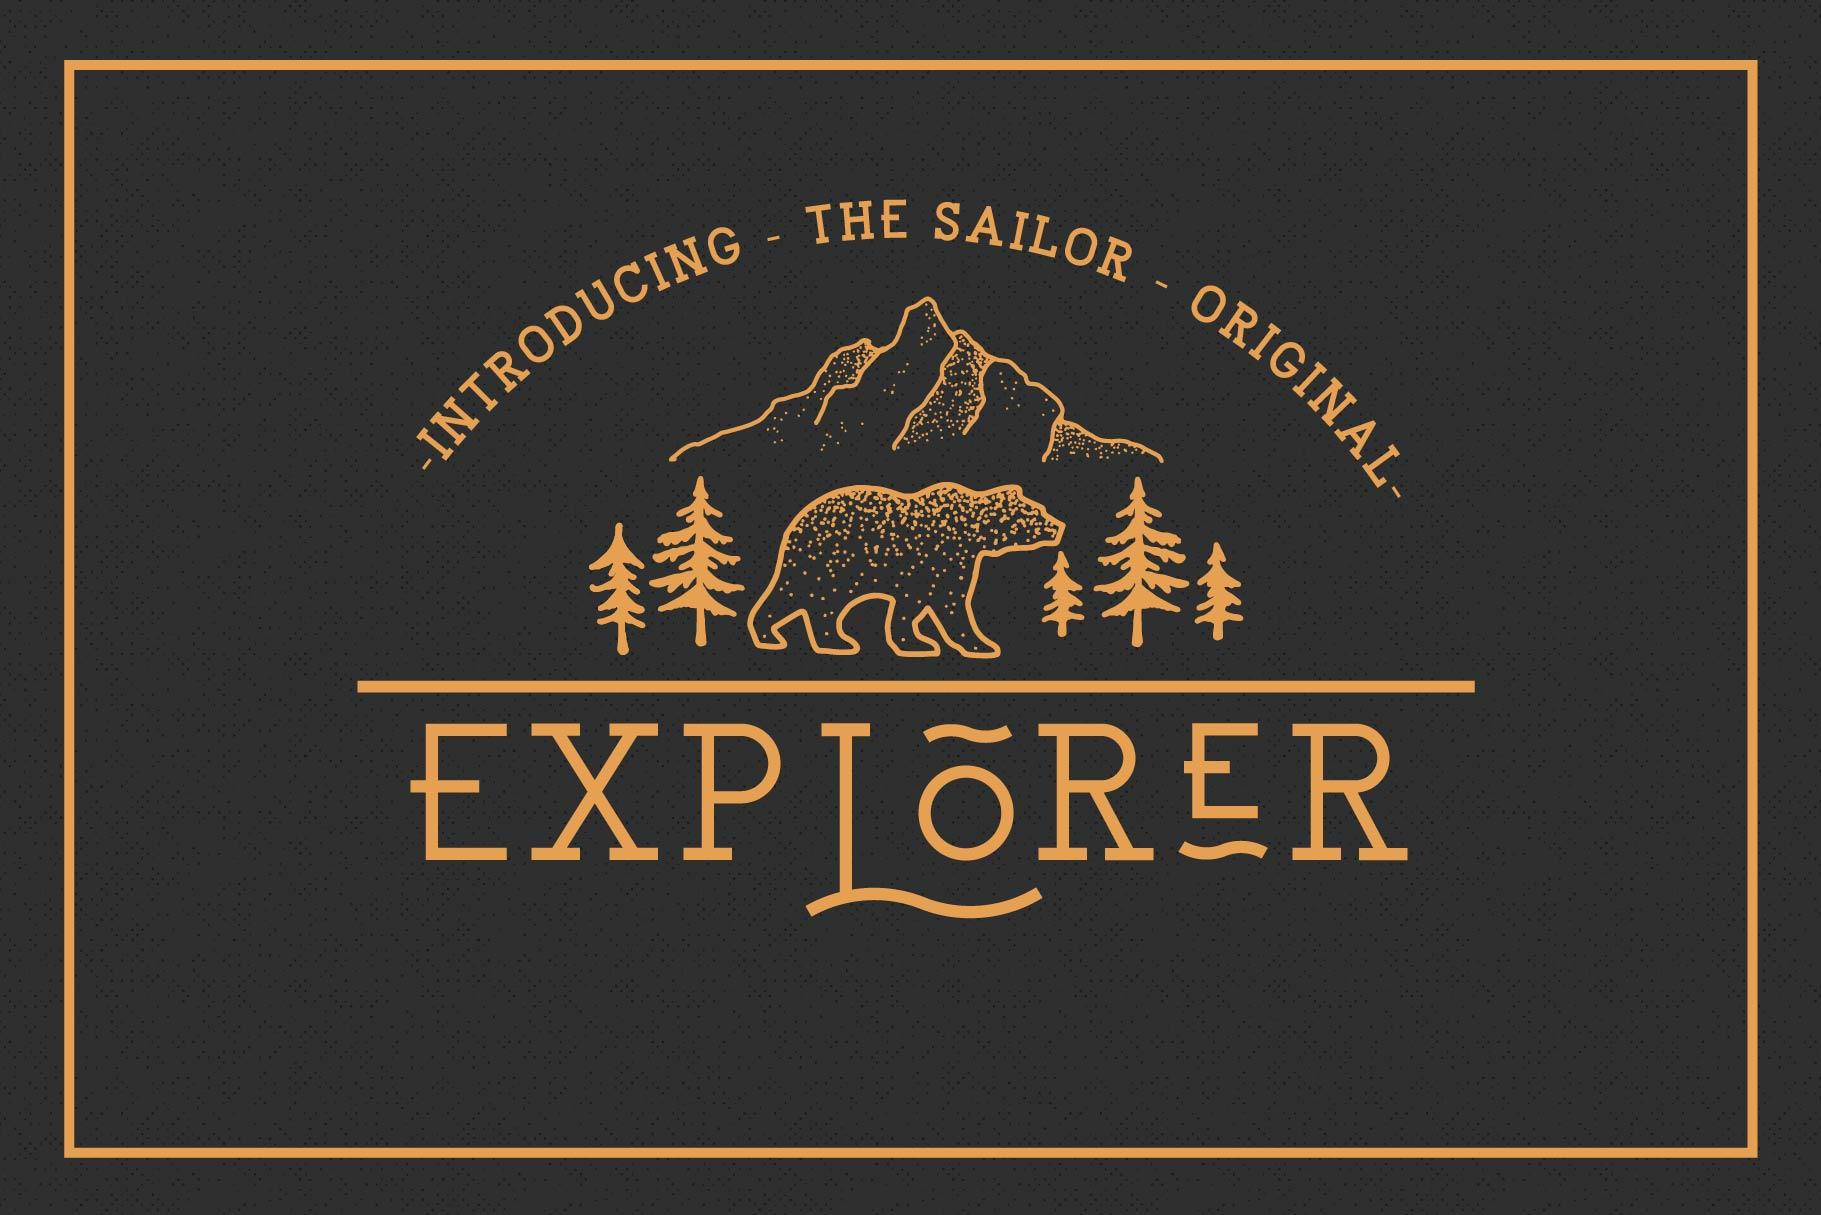 EXPLORER - Sailor Original Typeface example image 1